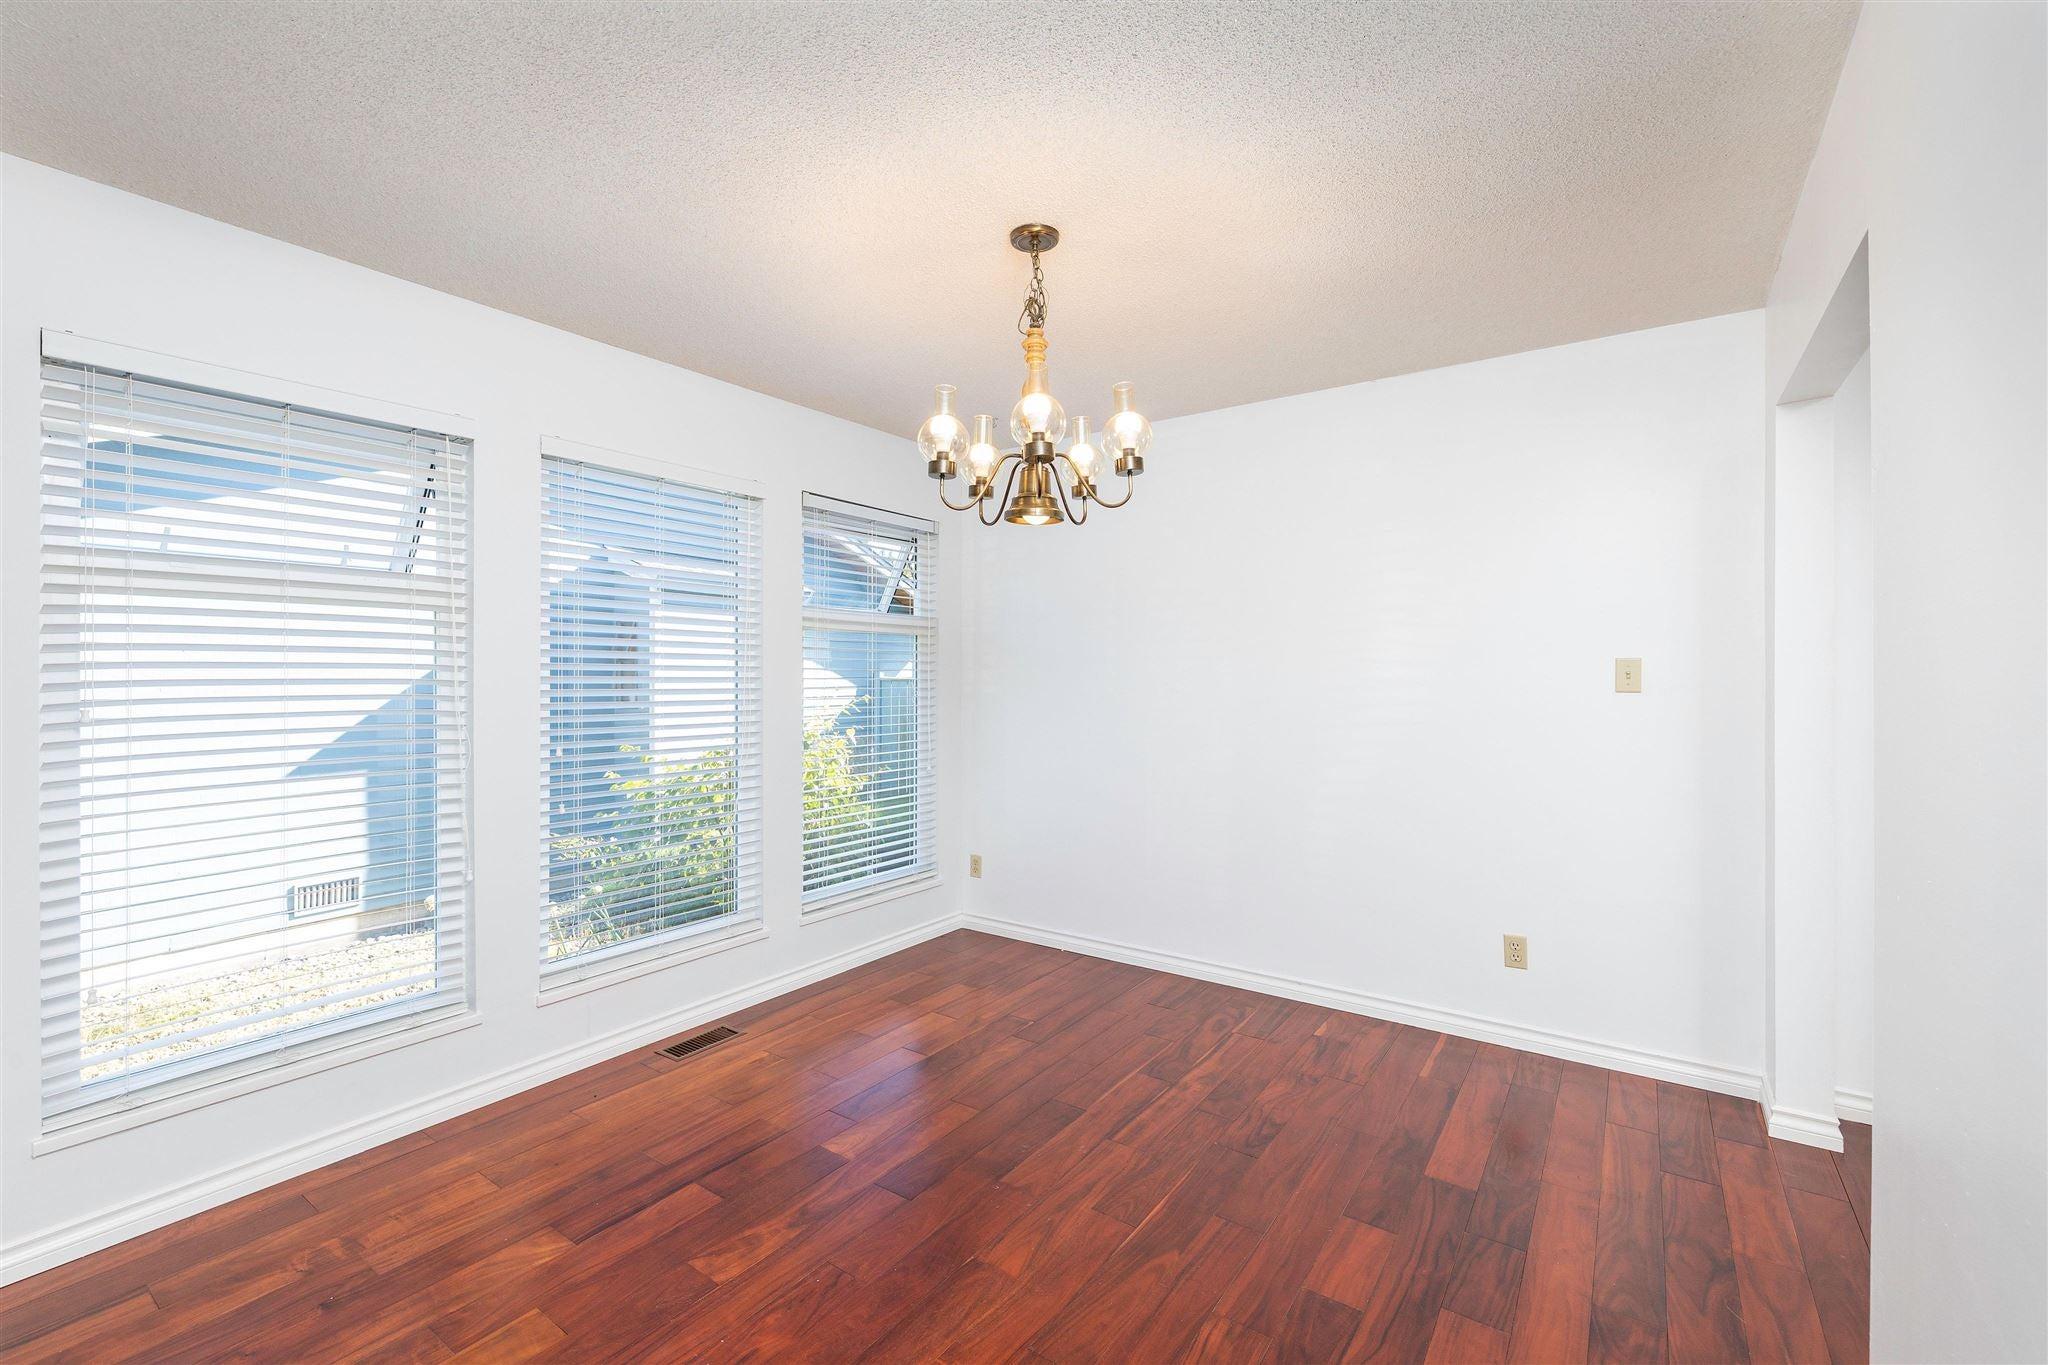 1743 148A STREET - Sunnyside Park Surrey House/Single Family for sale, 3 Bedrooms (R2604804) - #7